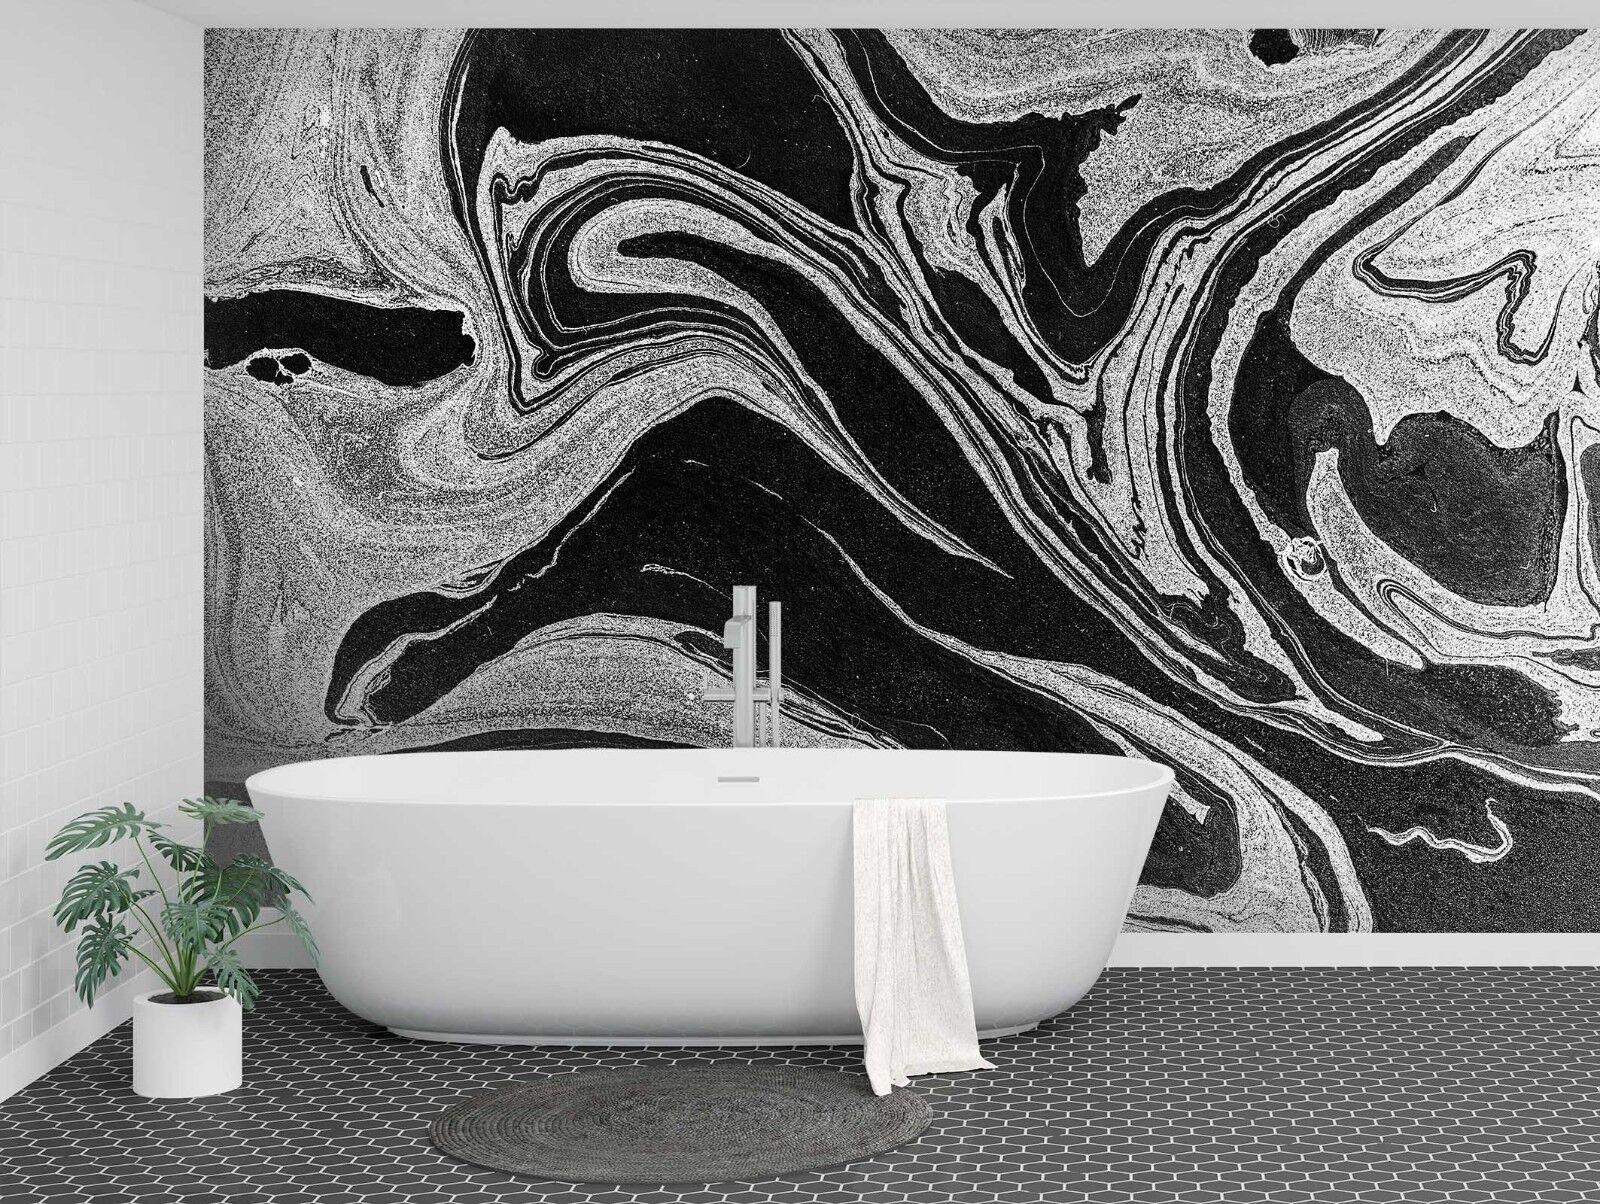 3D Schwarz Muster 7568 Textur Fliesen Marmor Tapeten Abziehbild Tapete Wandbild